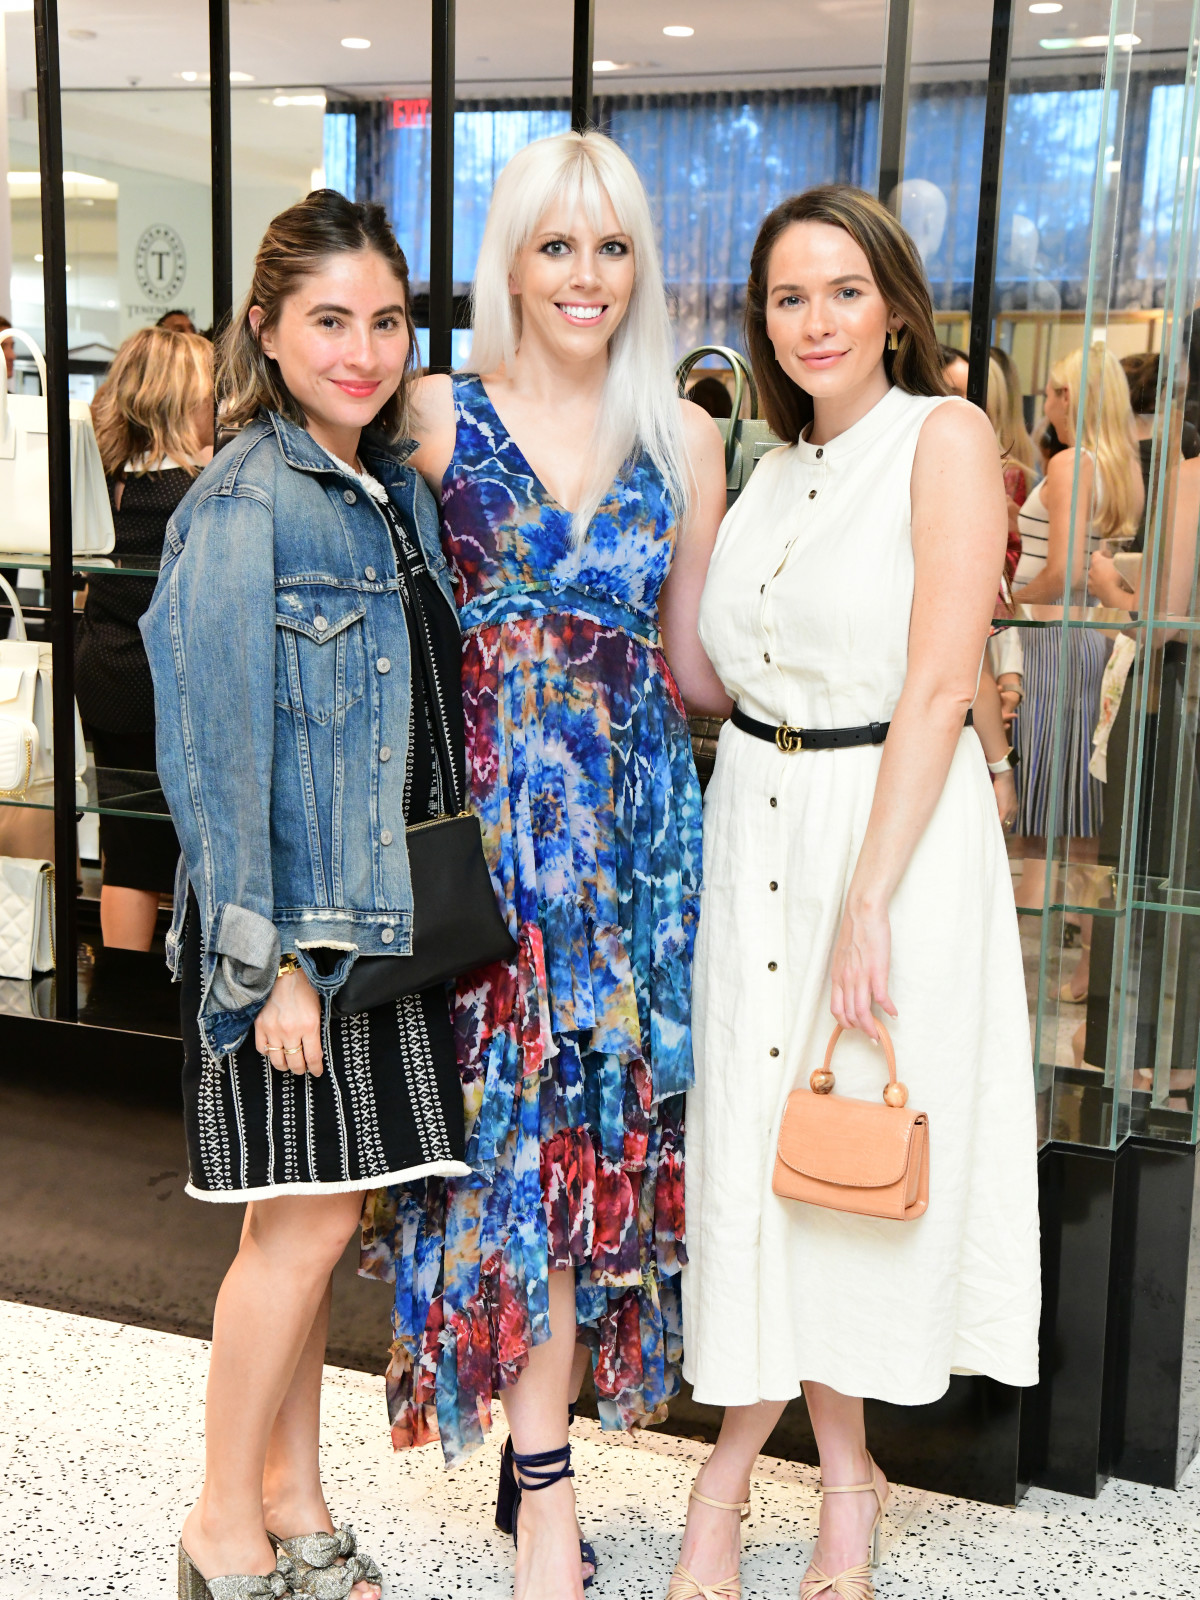 Summer Soiree Dress for Success WOW Tootsies Paulina Padilla, Meagan Thomason, Hannah Swiggard